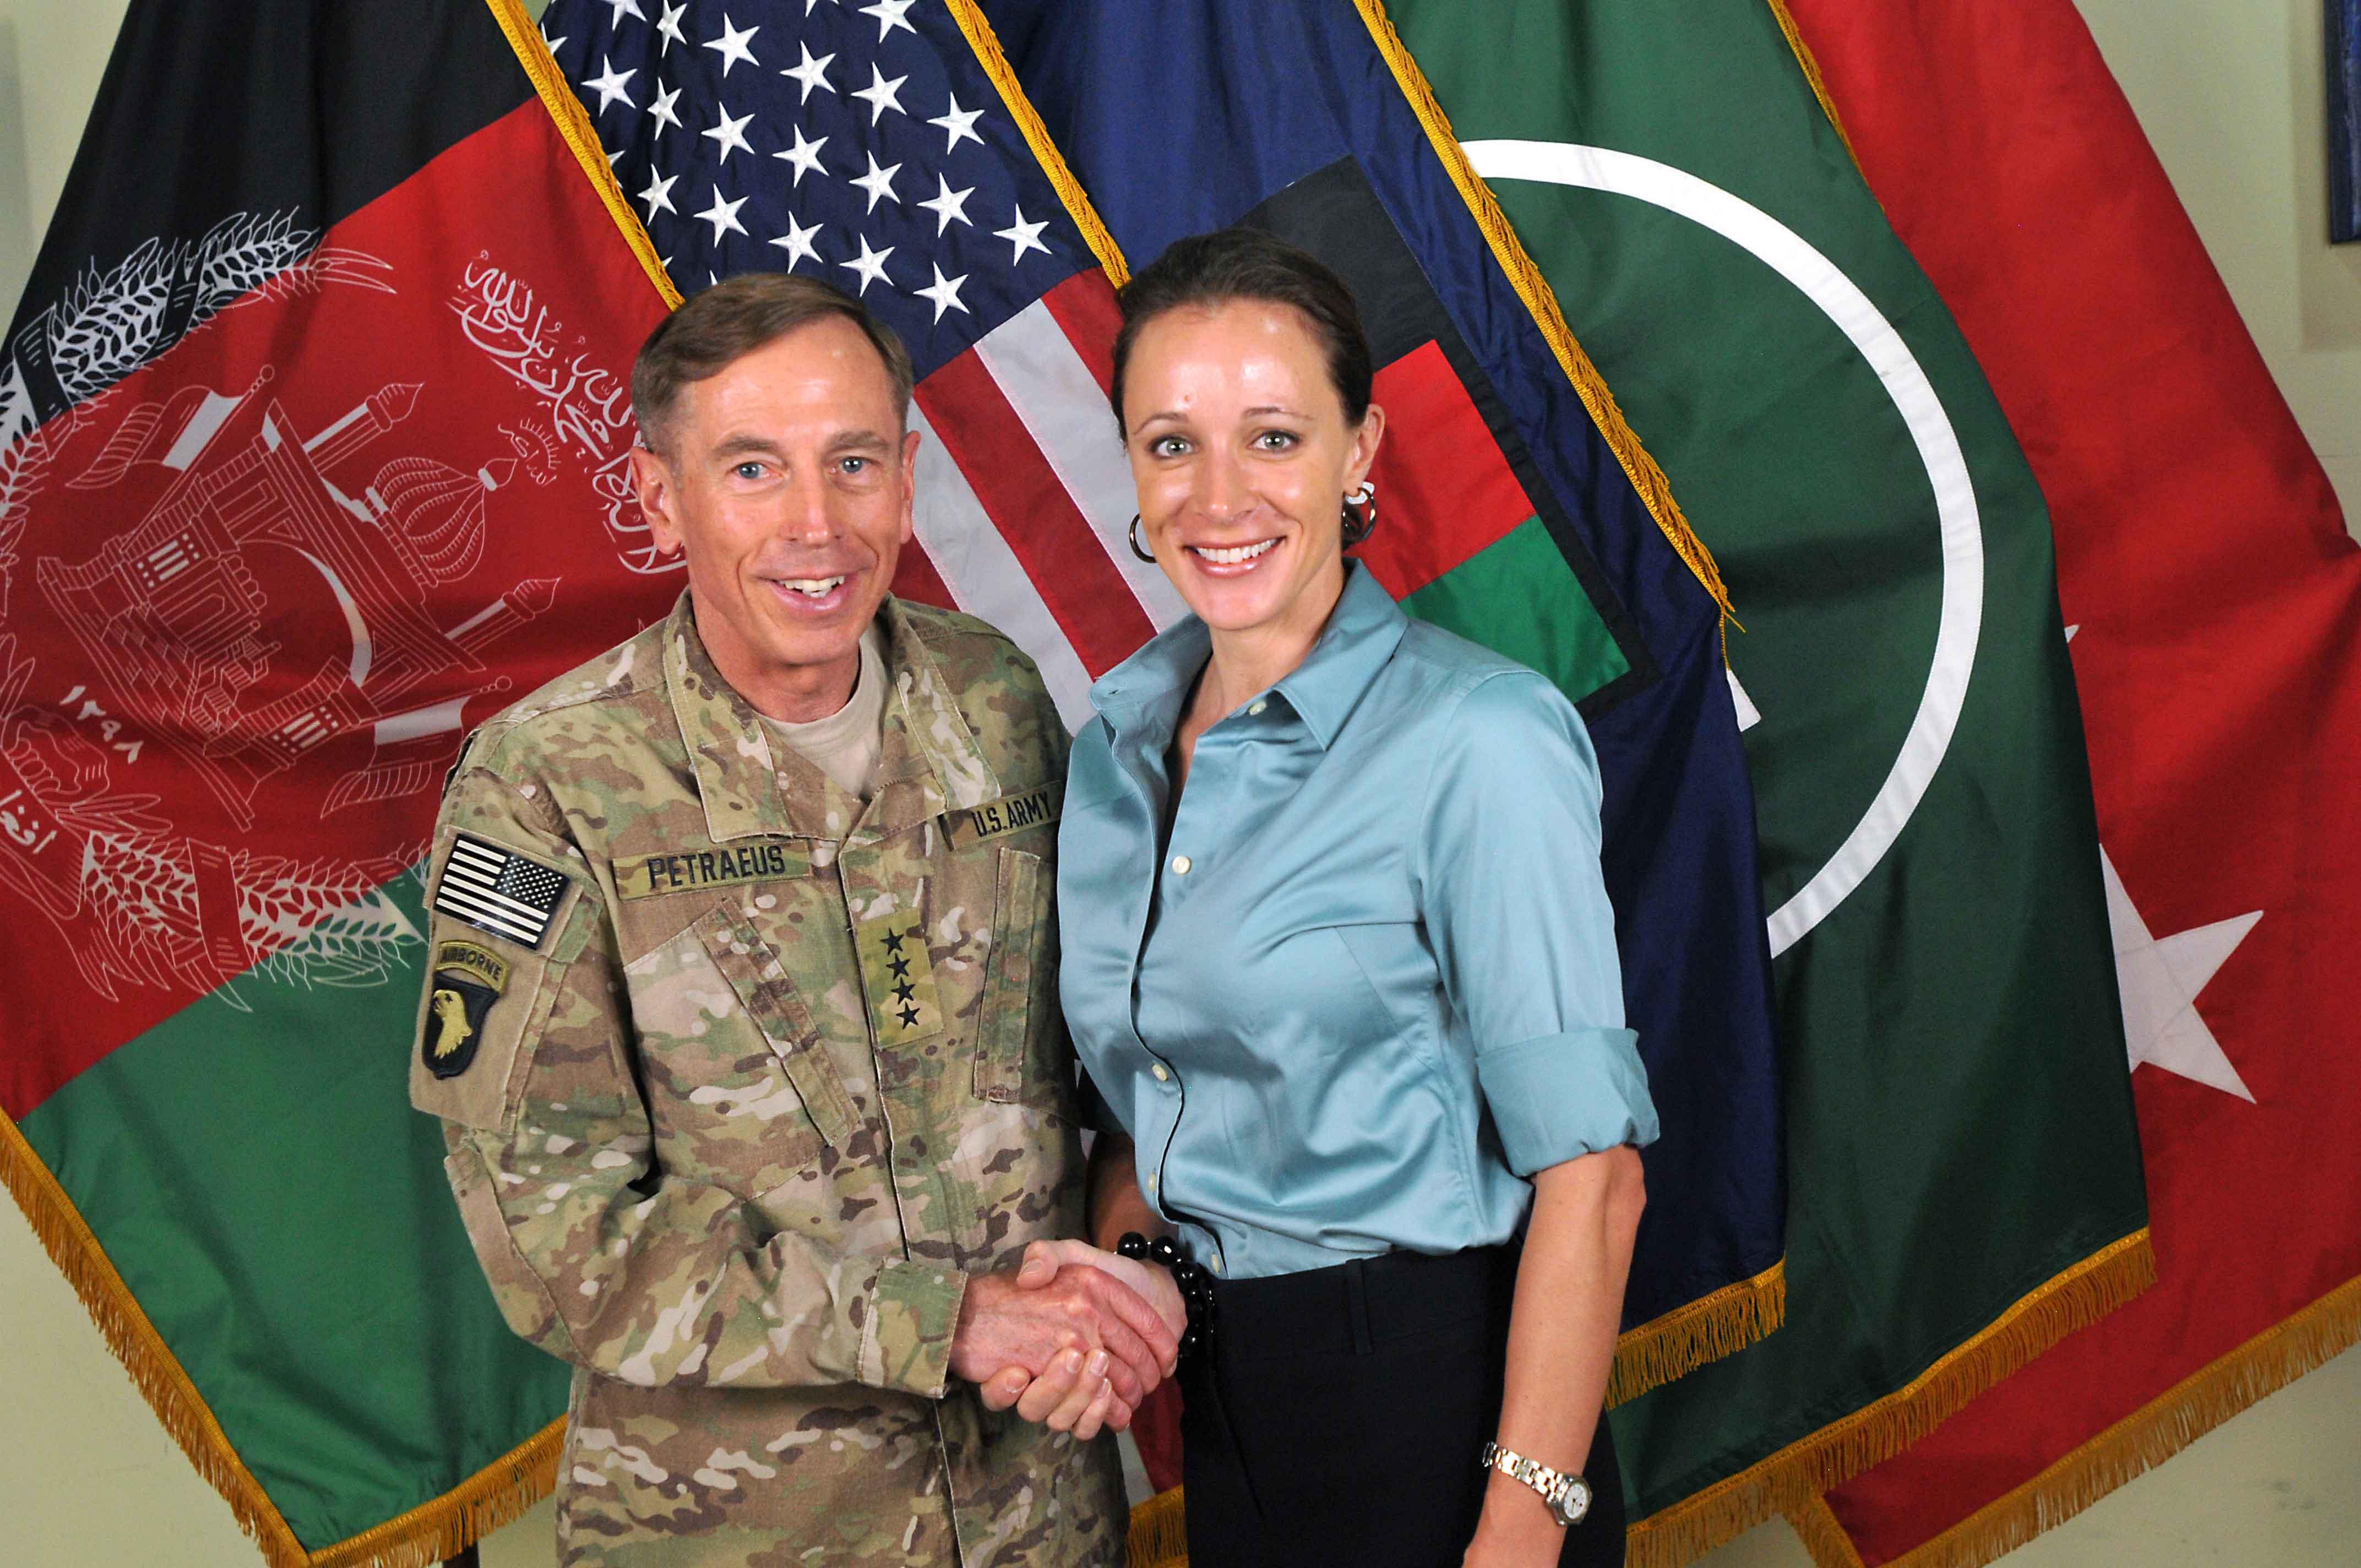 CIA Director Gen. David Petraeus Resigns After Affair with Paula Broadwell